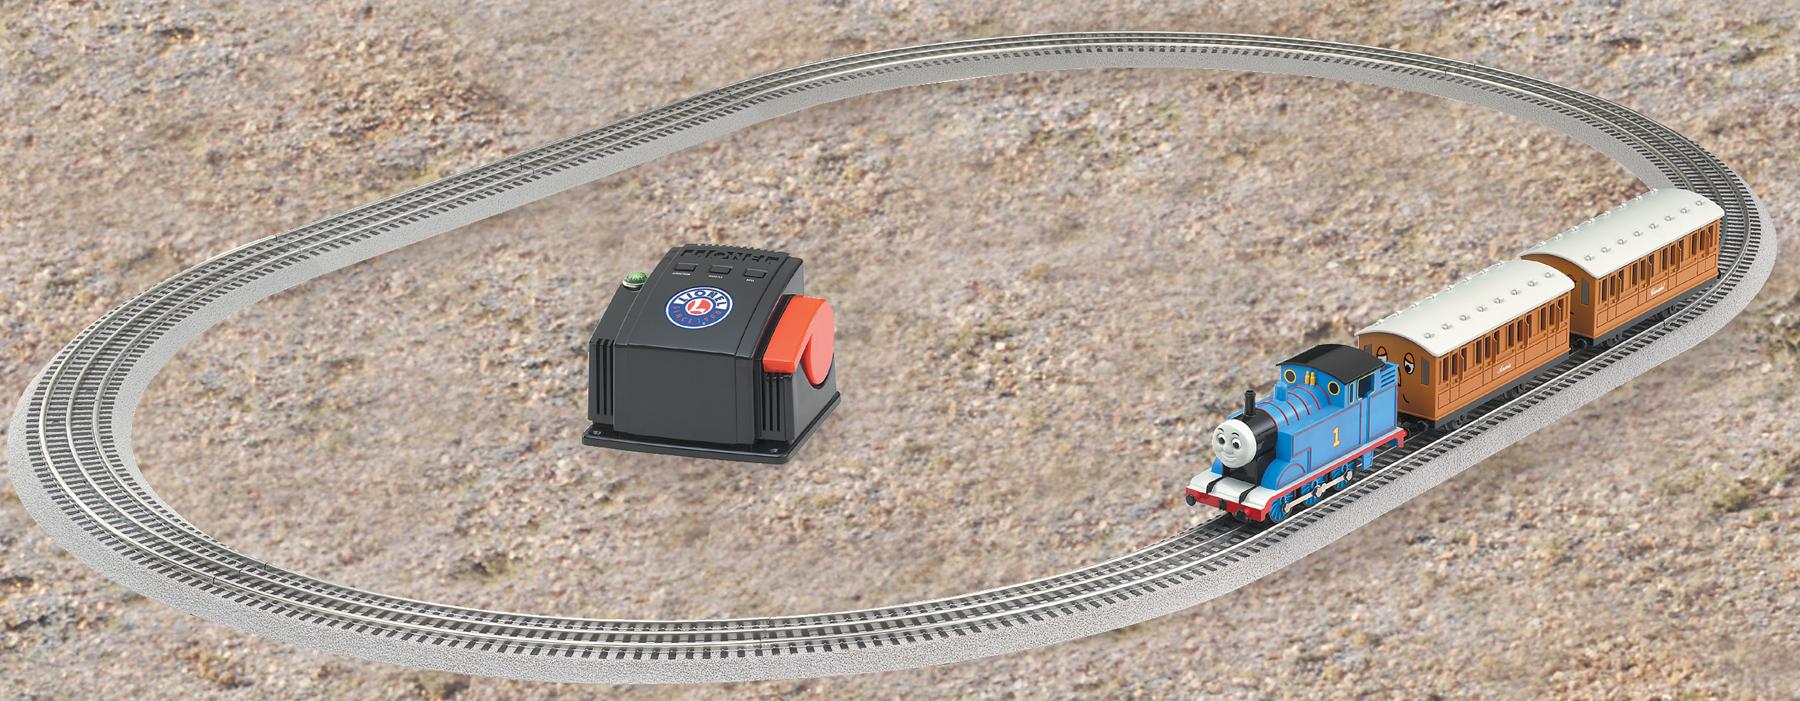 lionel train transformer wiring diagram [ 1800 x 701 Pixel ]